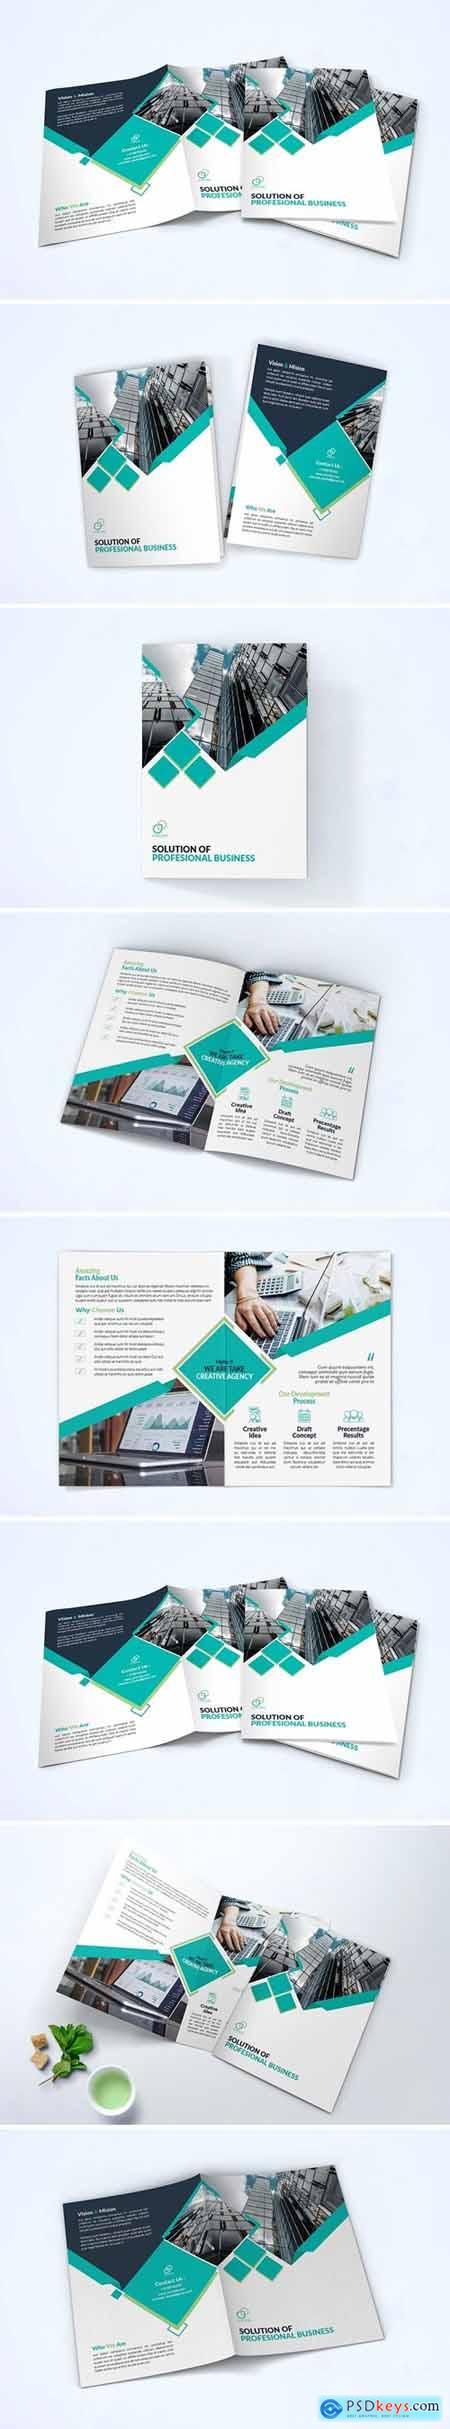 Bifold Brochure BRUXQJA